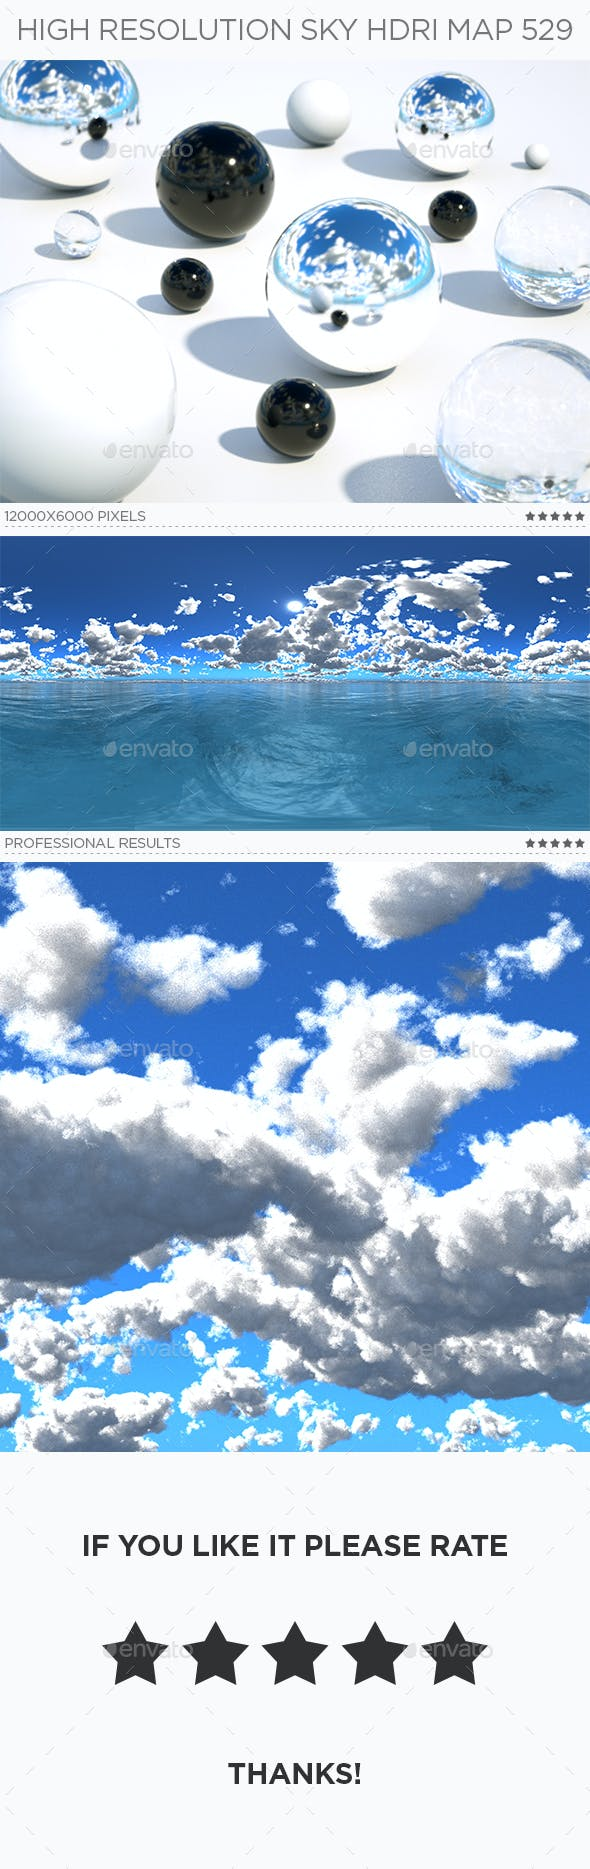 High Resolution Sky HDRi Map 529 - 3DOcean Item for Sale